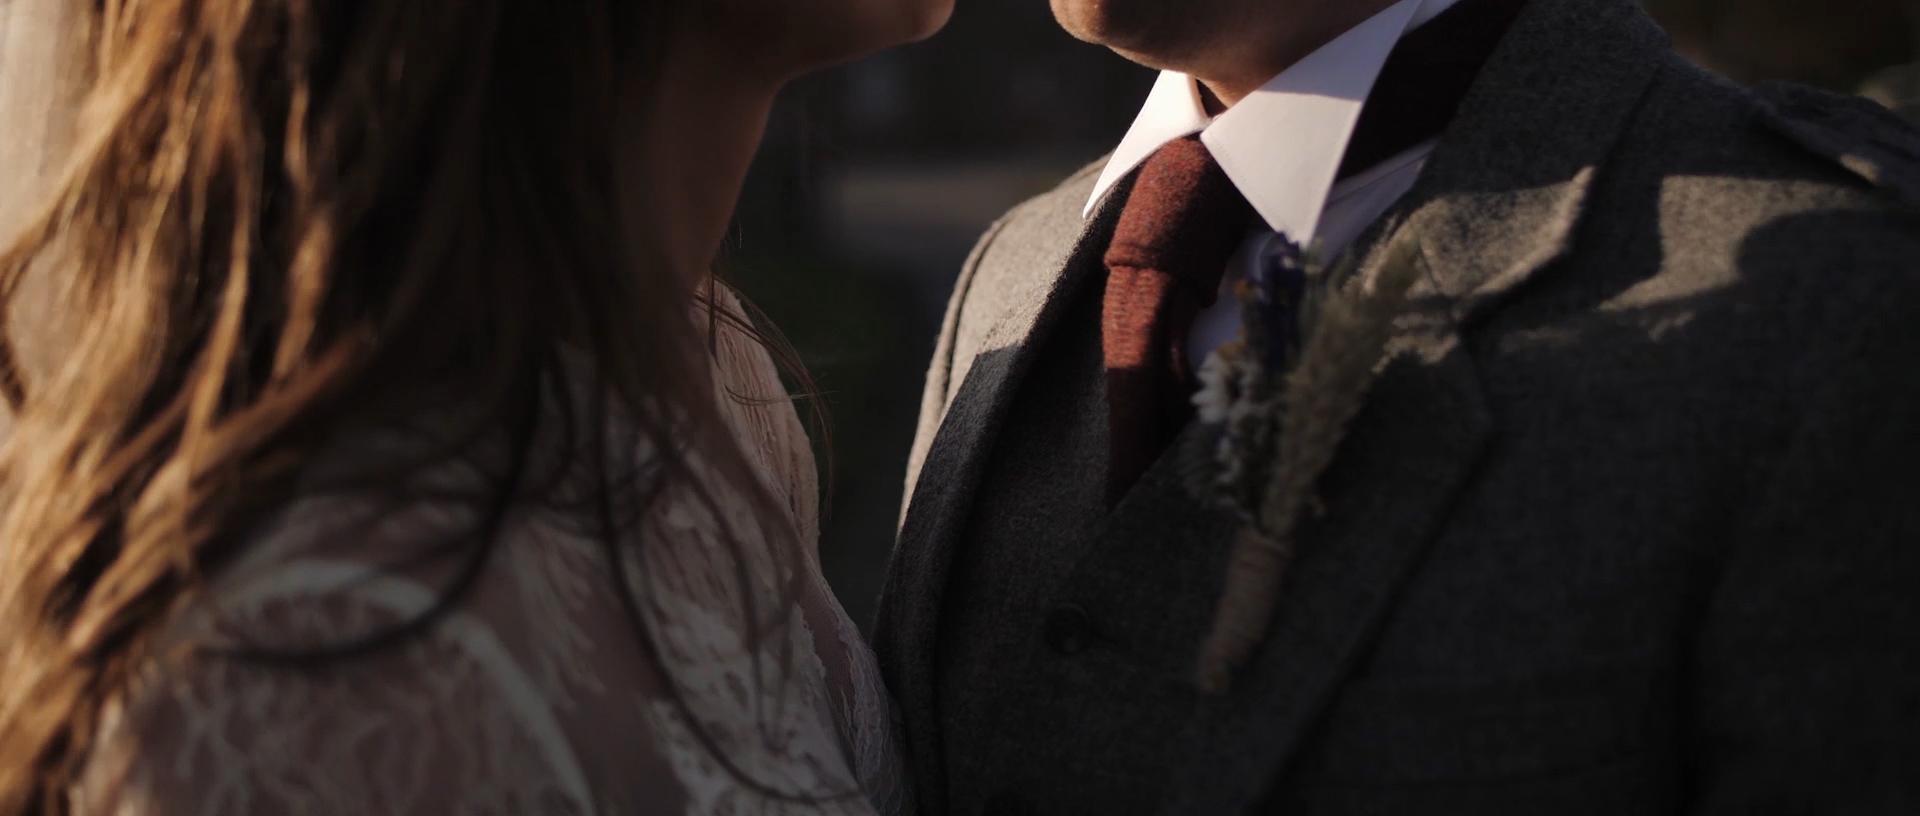 ardanaiseig-wedding-videographer_LL_04.jpg